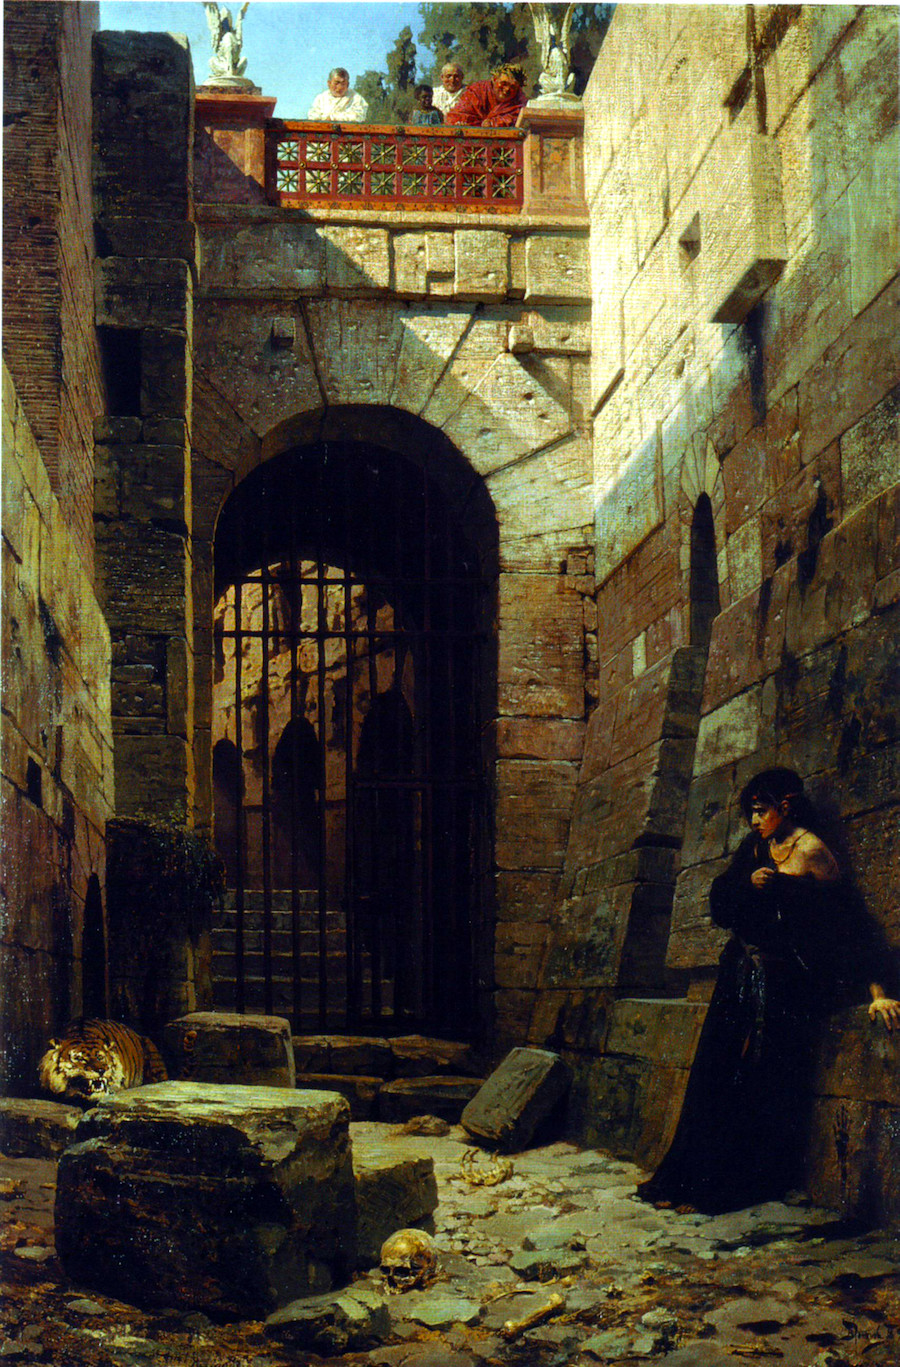 ' Objicĕre bestiis ', devoured by beasts. Painting (1879) by  Vasiliy Polenov : 'Caesar's Delight'.